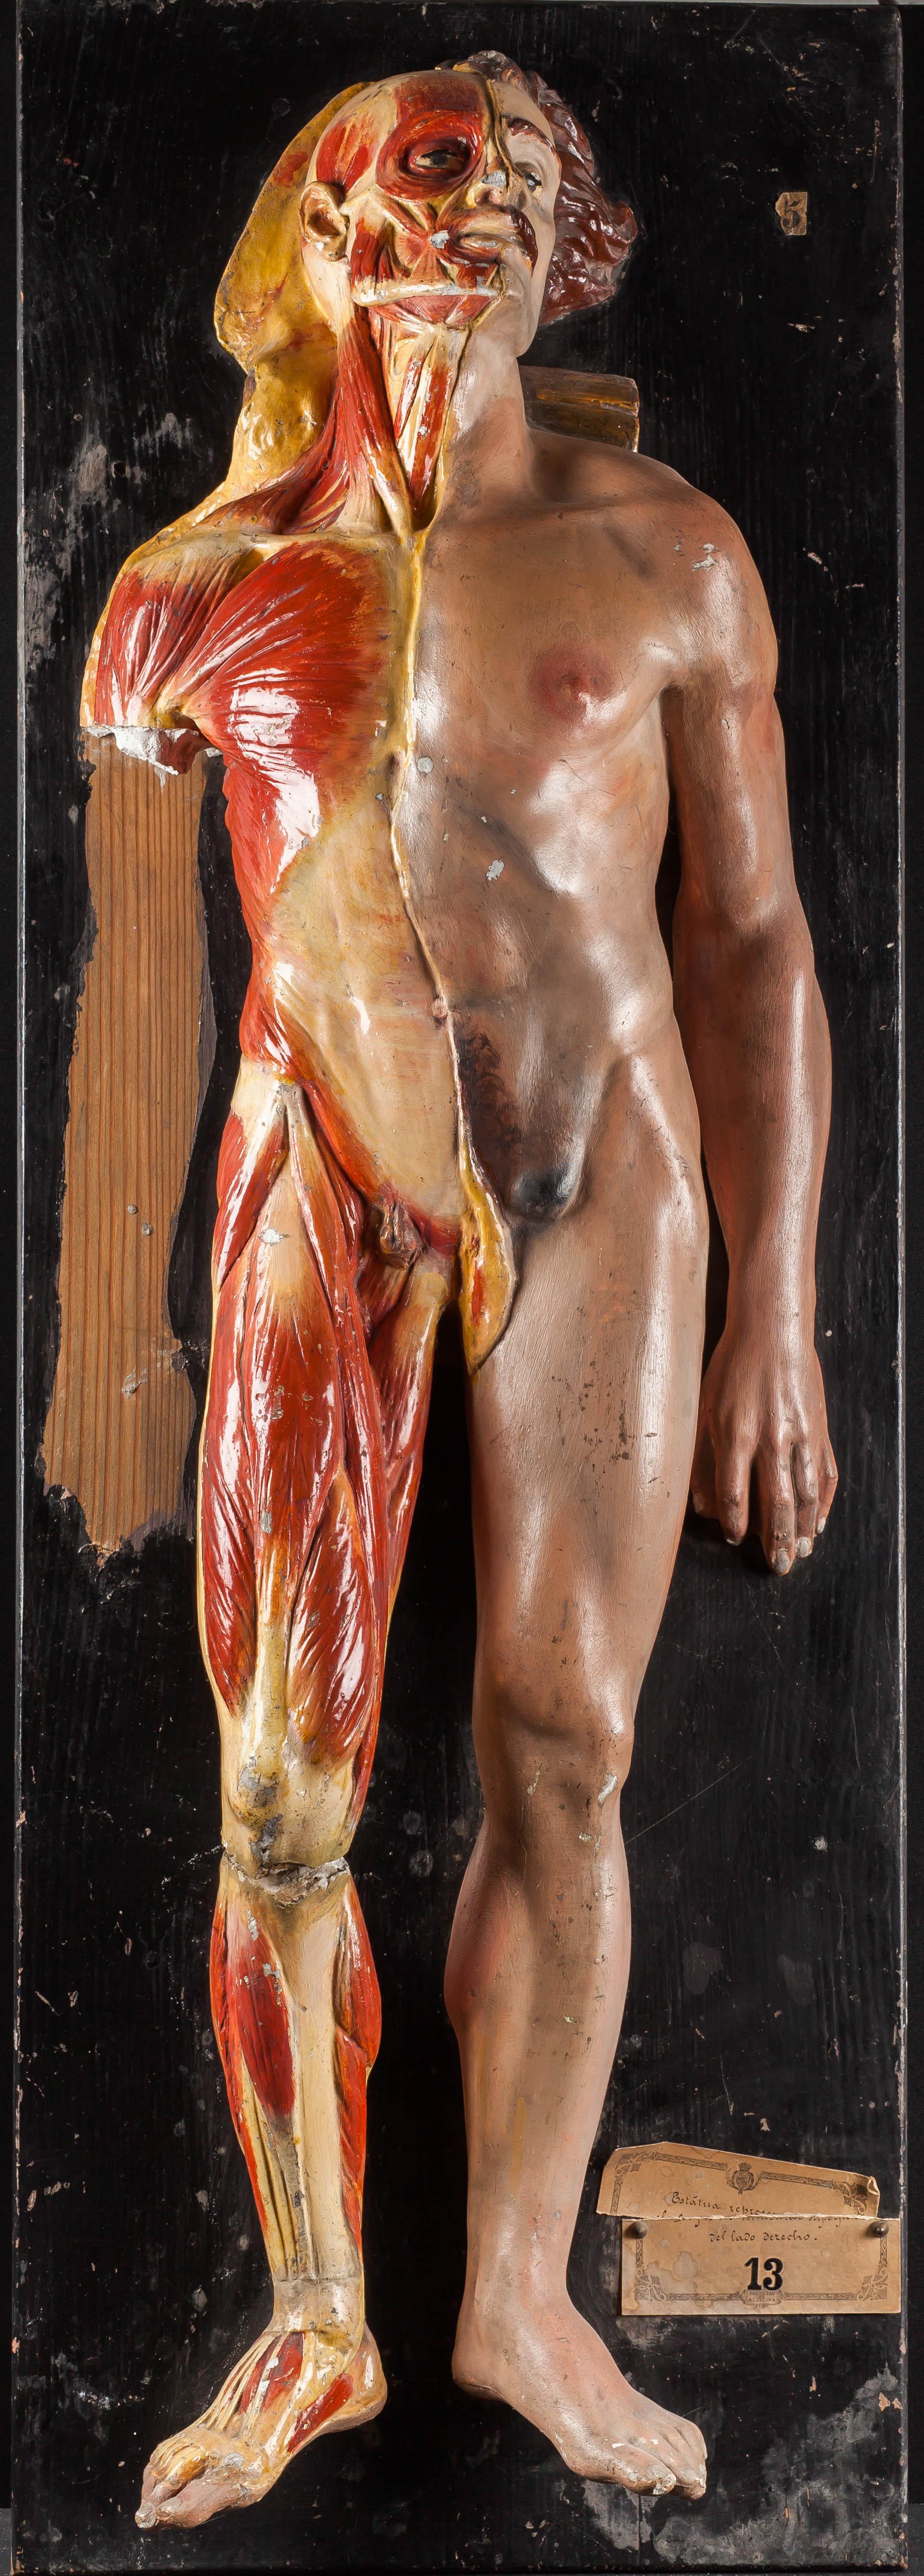 IES_SANISIDRO_MUSEO_Fisiologia_008